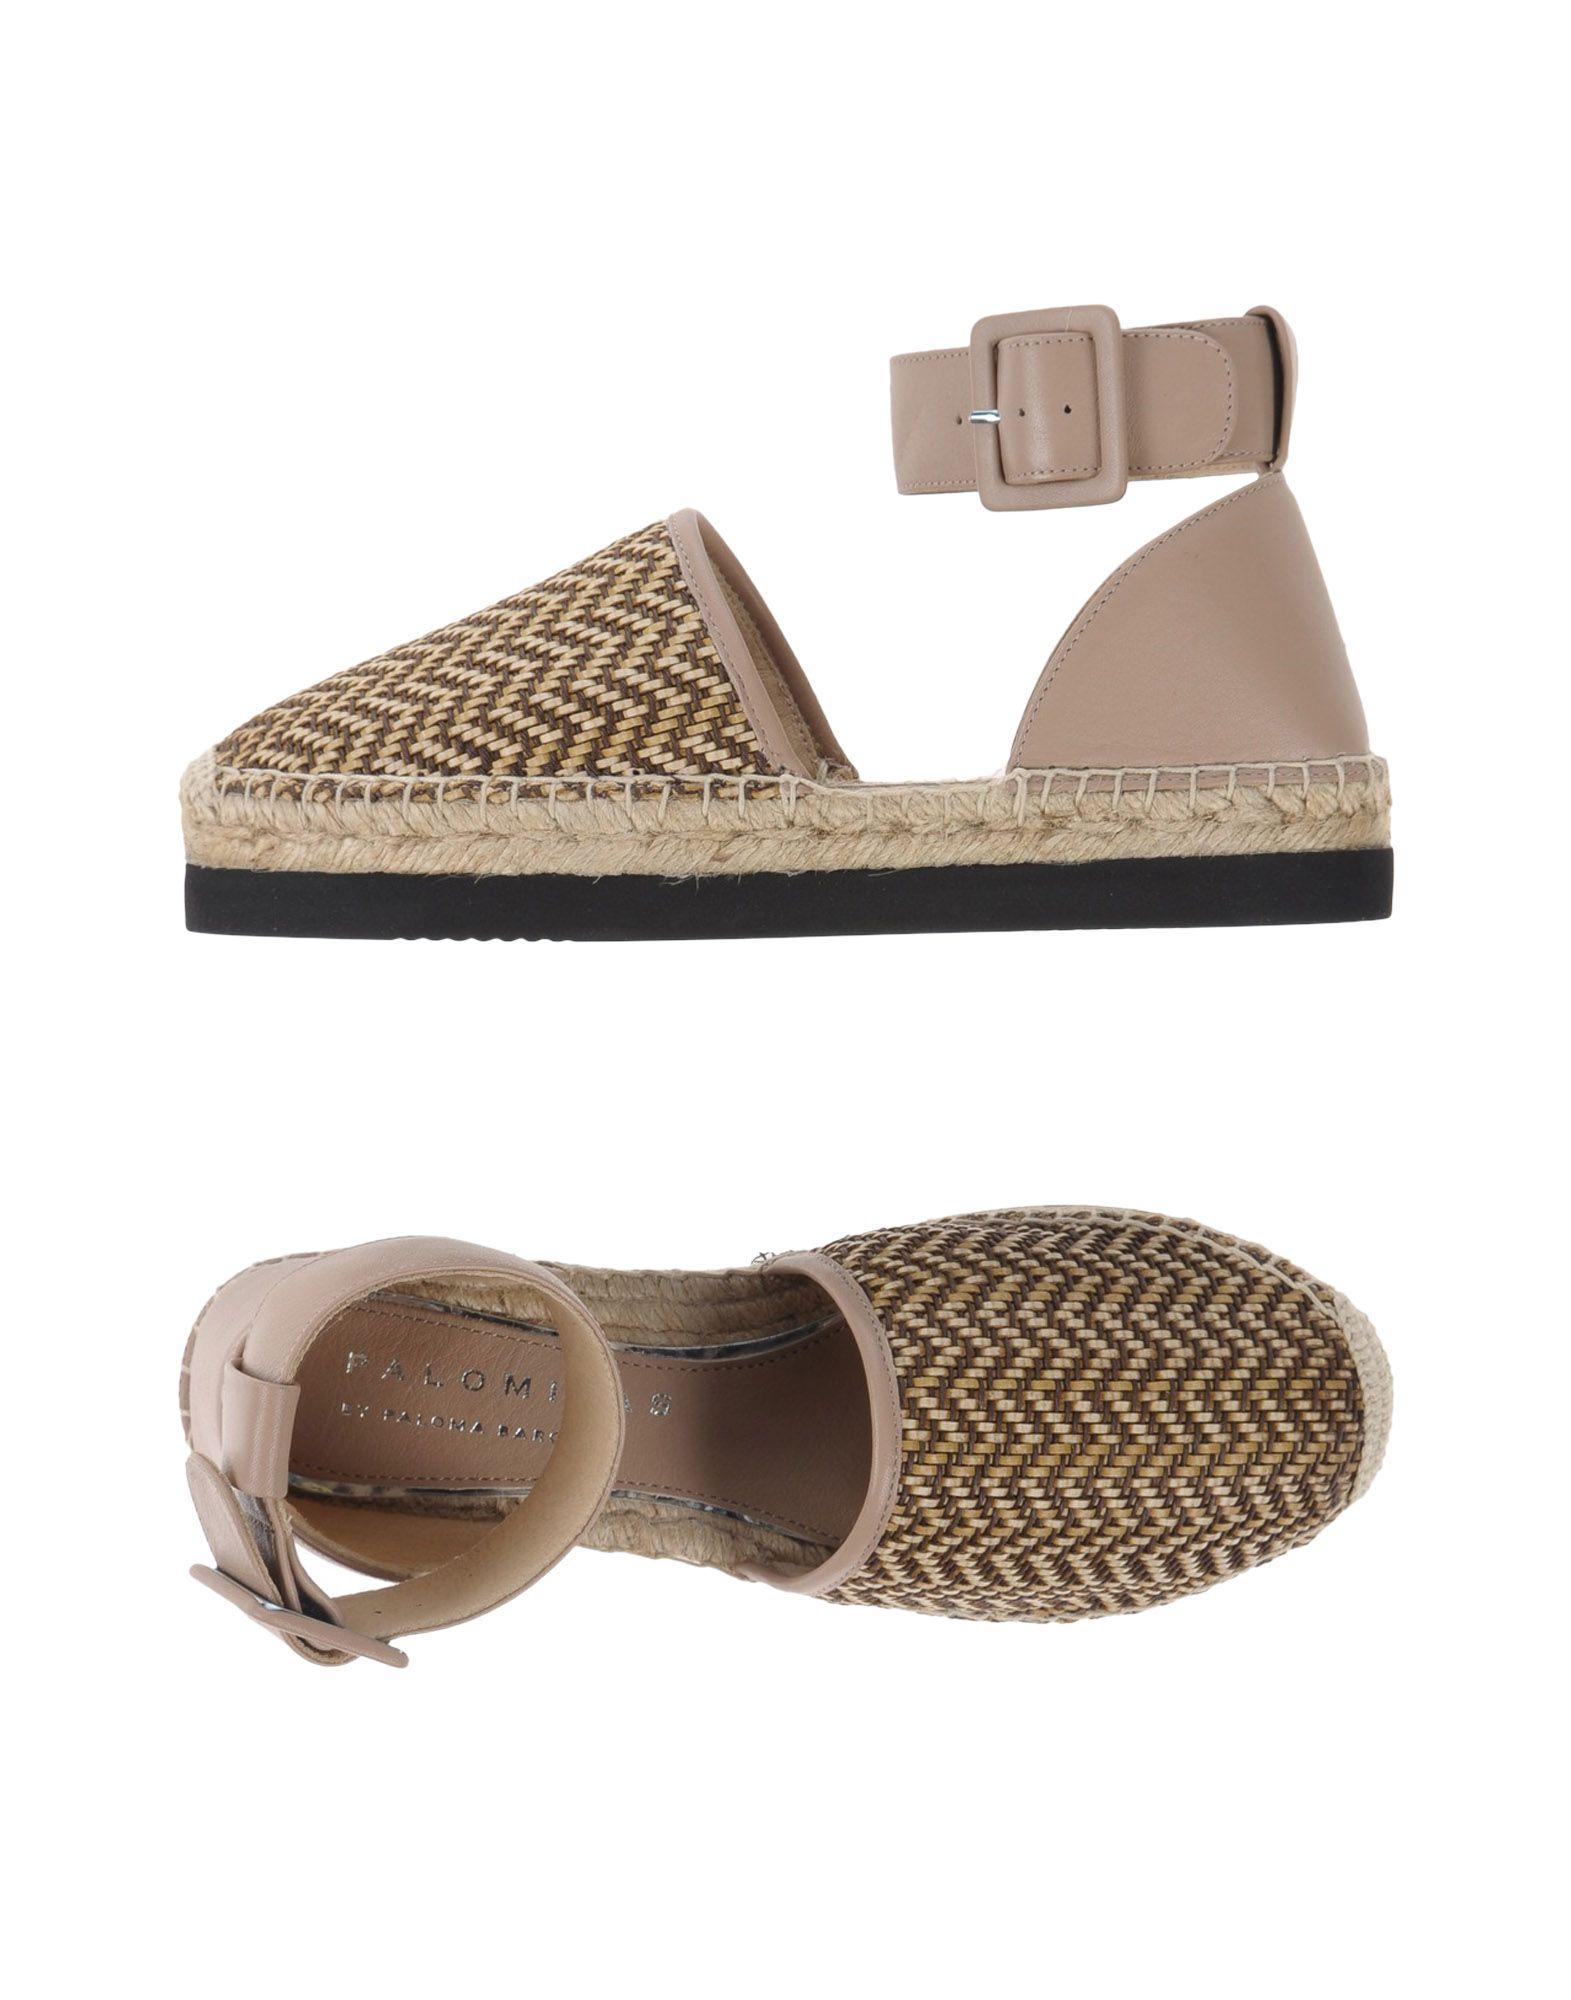 Palomitas By Paloma Barceló Espadrilles Damen  11102769AO Gute Qualität beliebte Schuhe